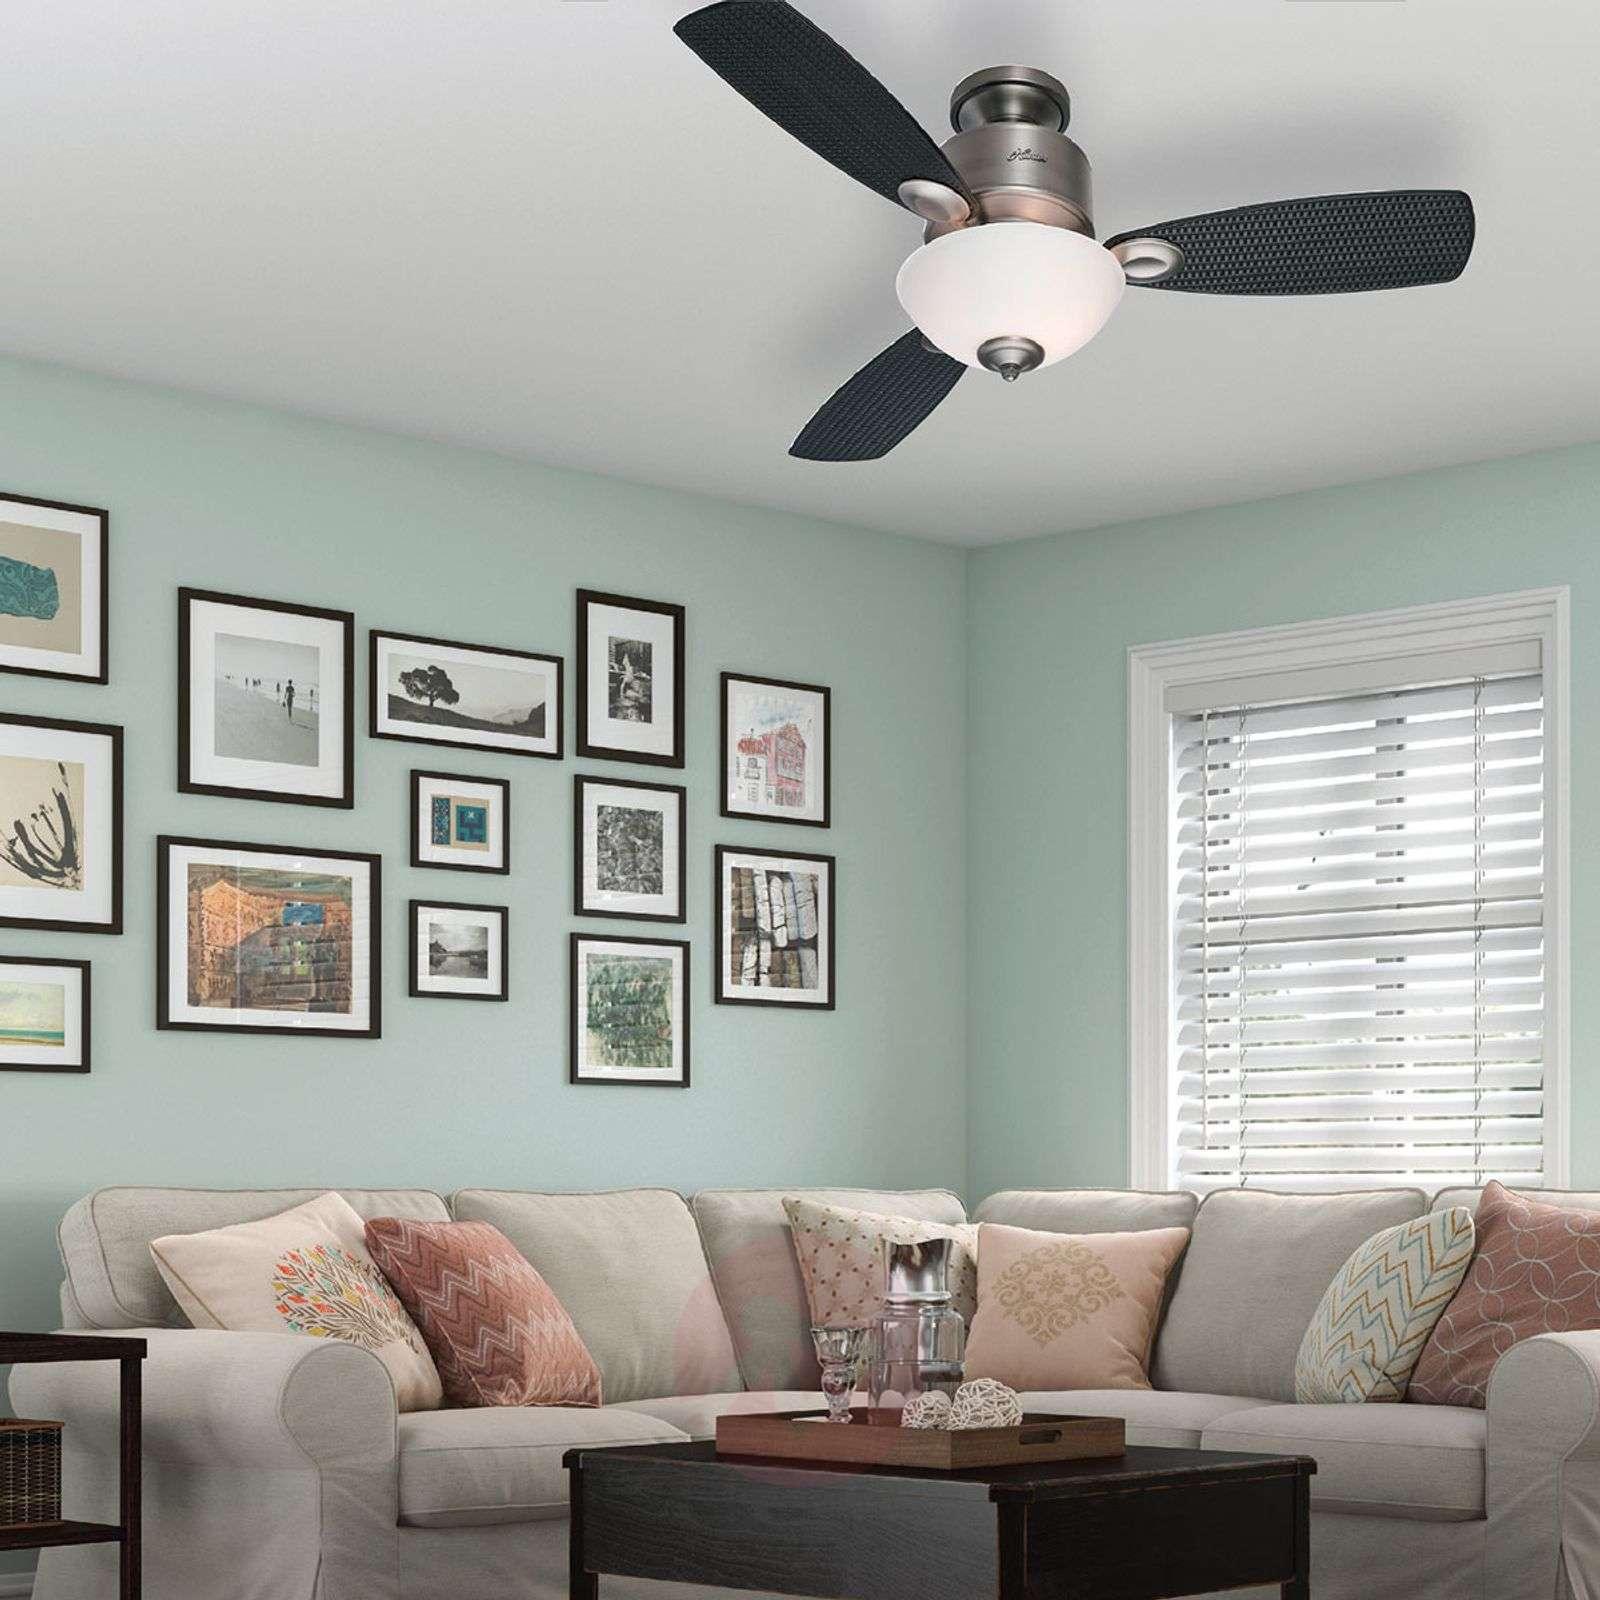 Hunter Kohala Bay illuminated ceiling fan-4545014-01